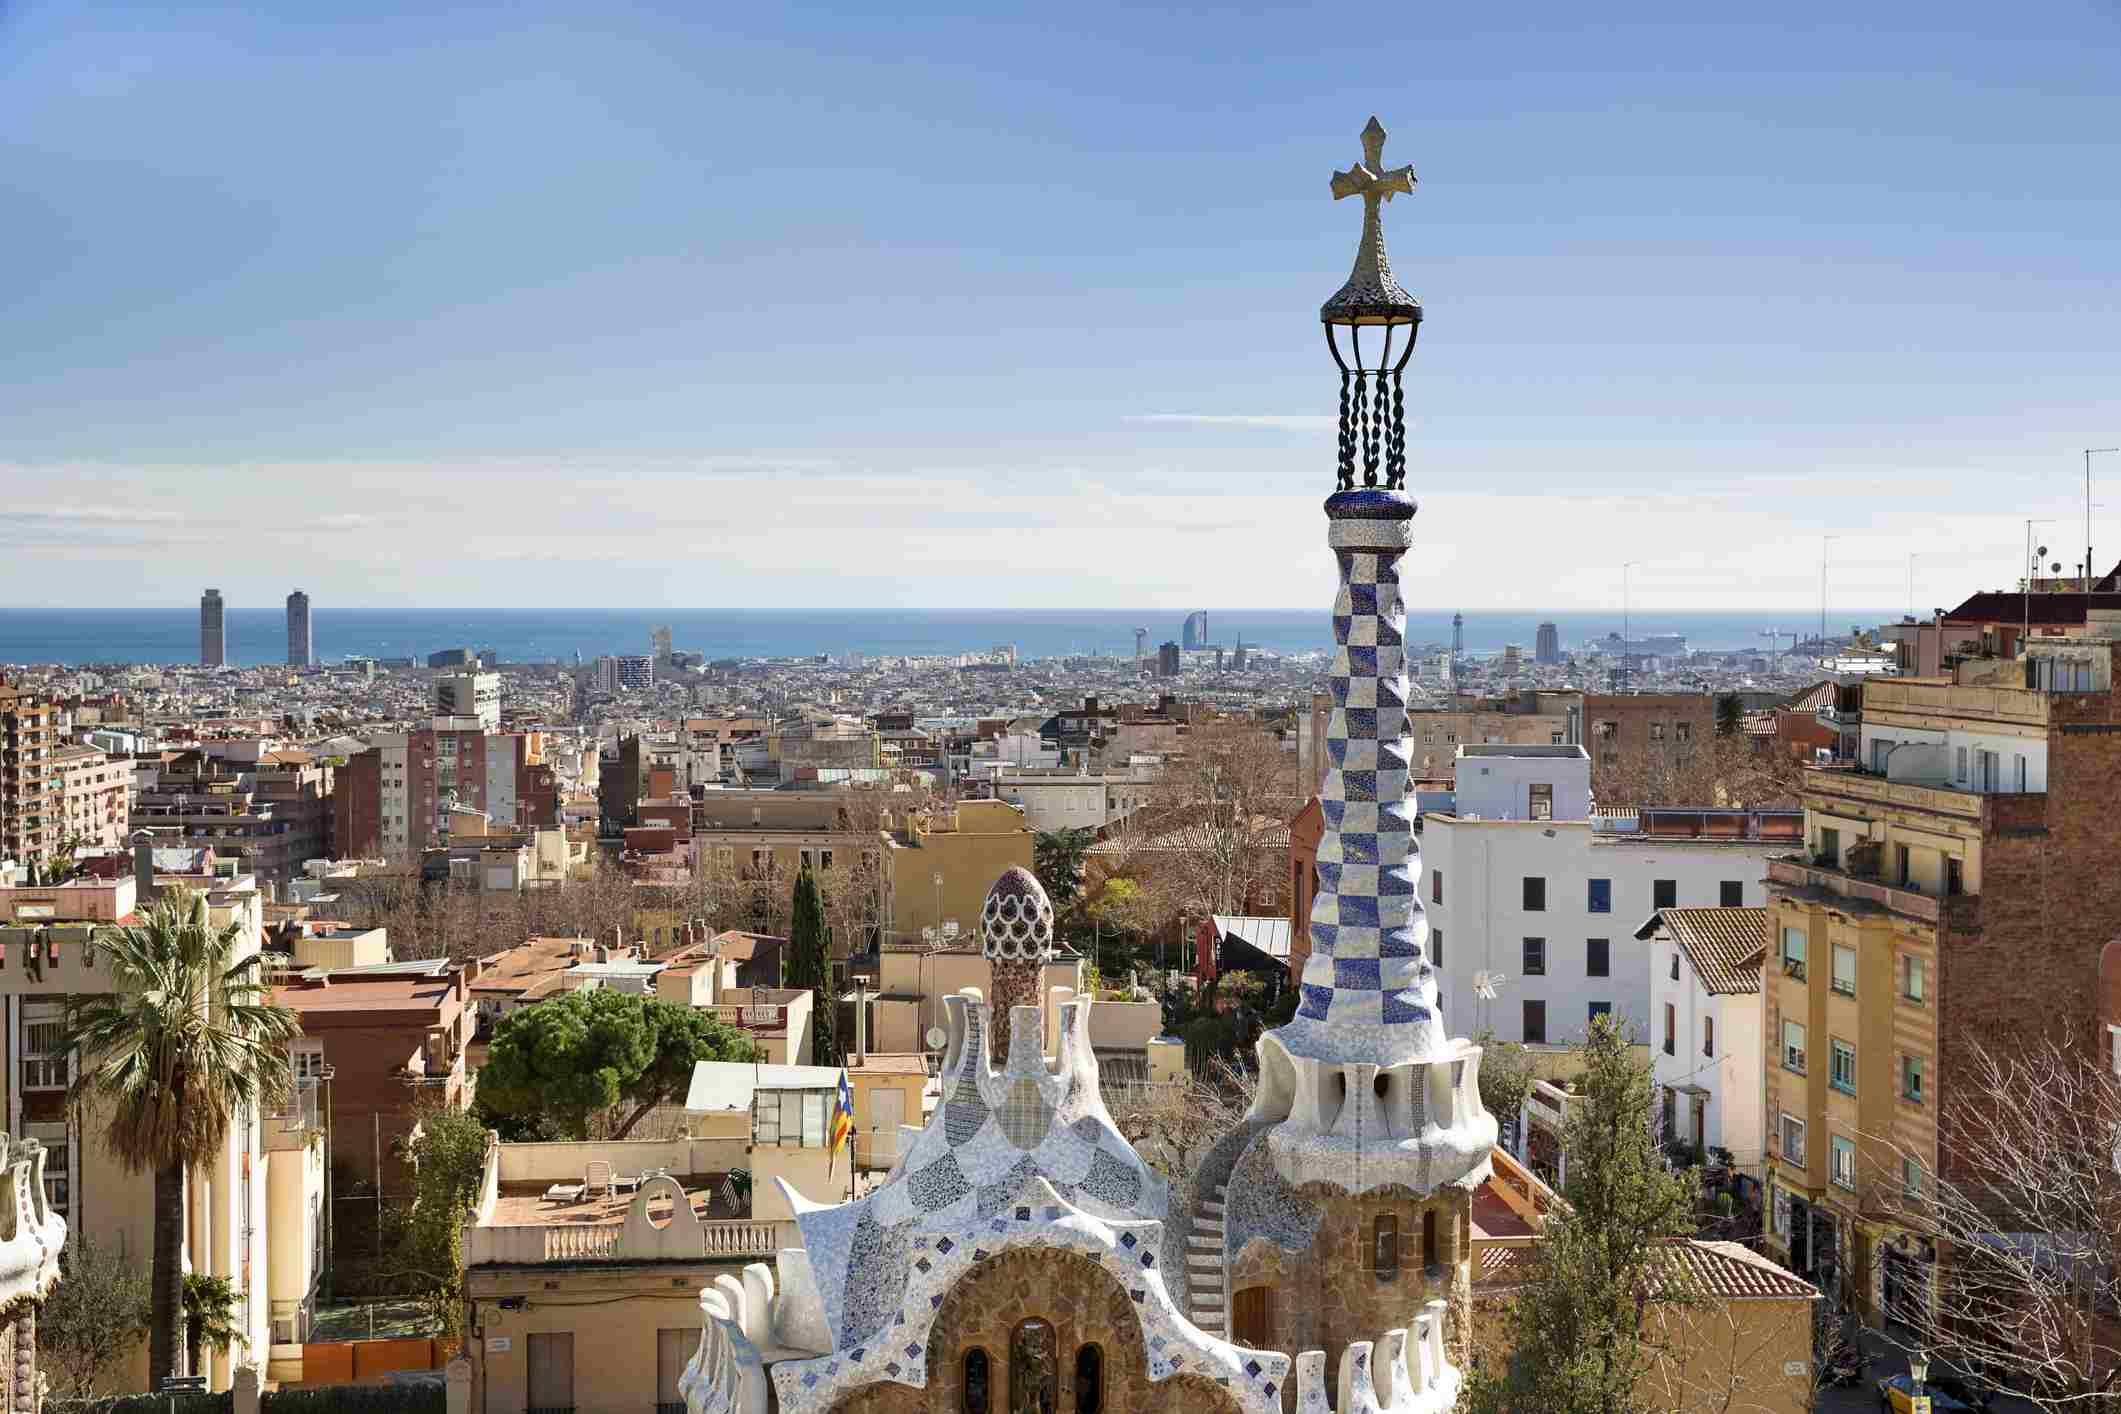 Barcelona Spain aerial view with Gaudi church